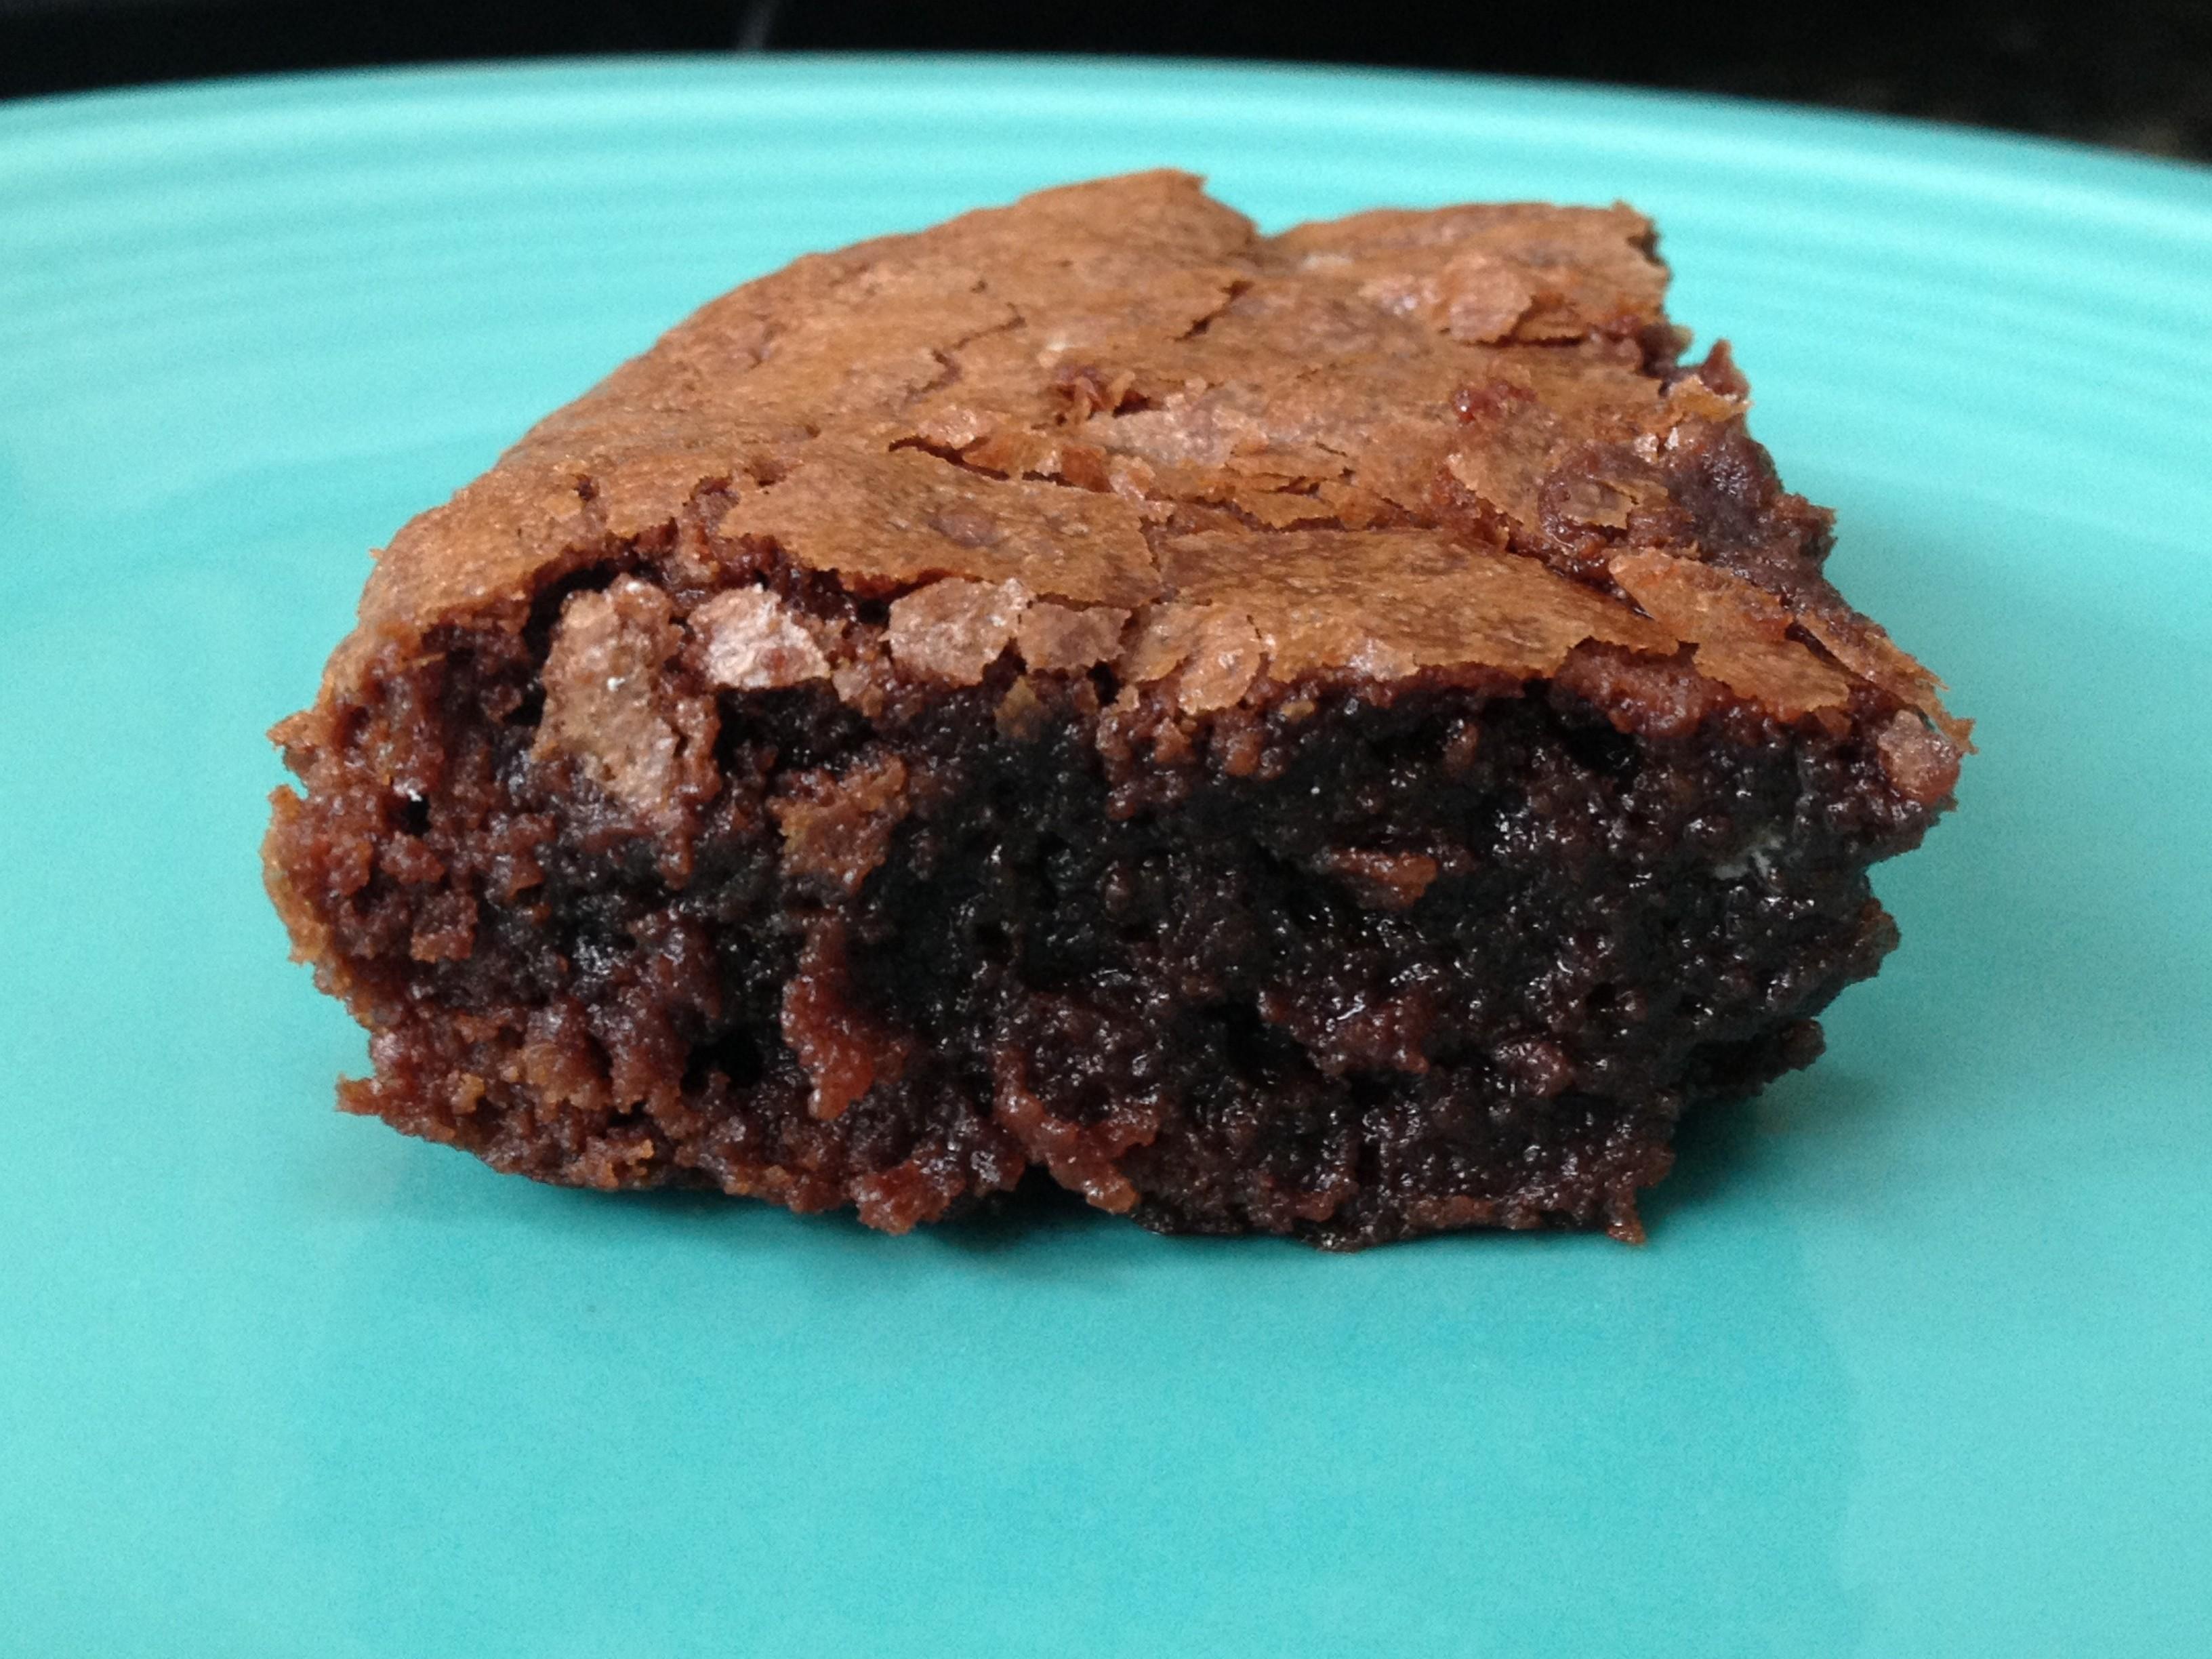 Blue apron brownies - Advertising